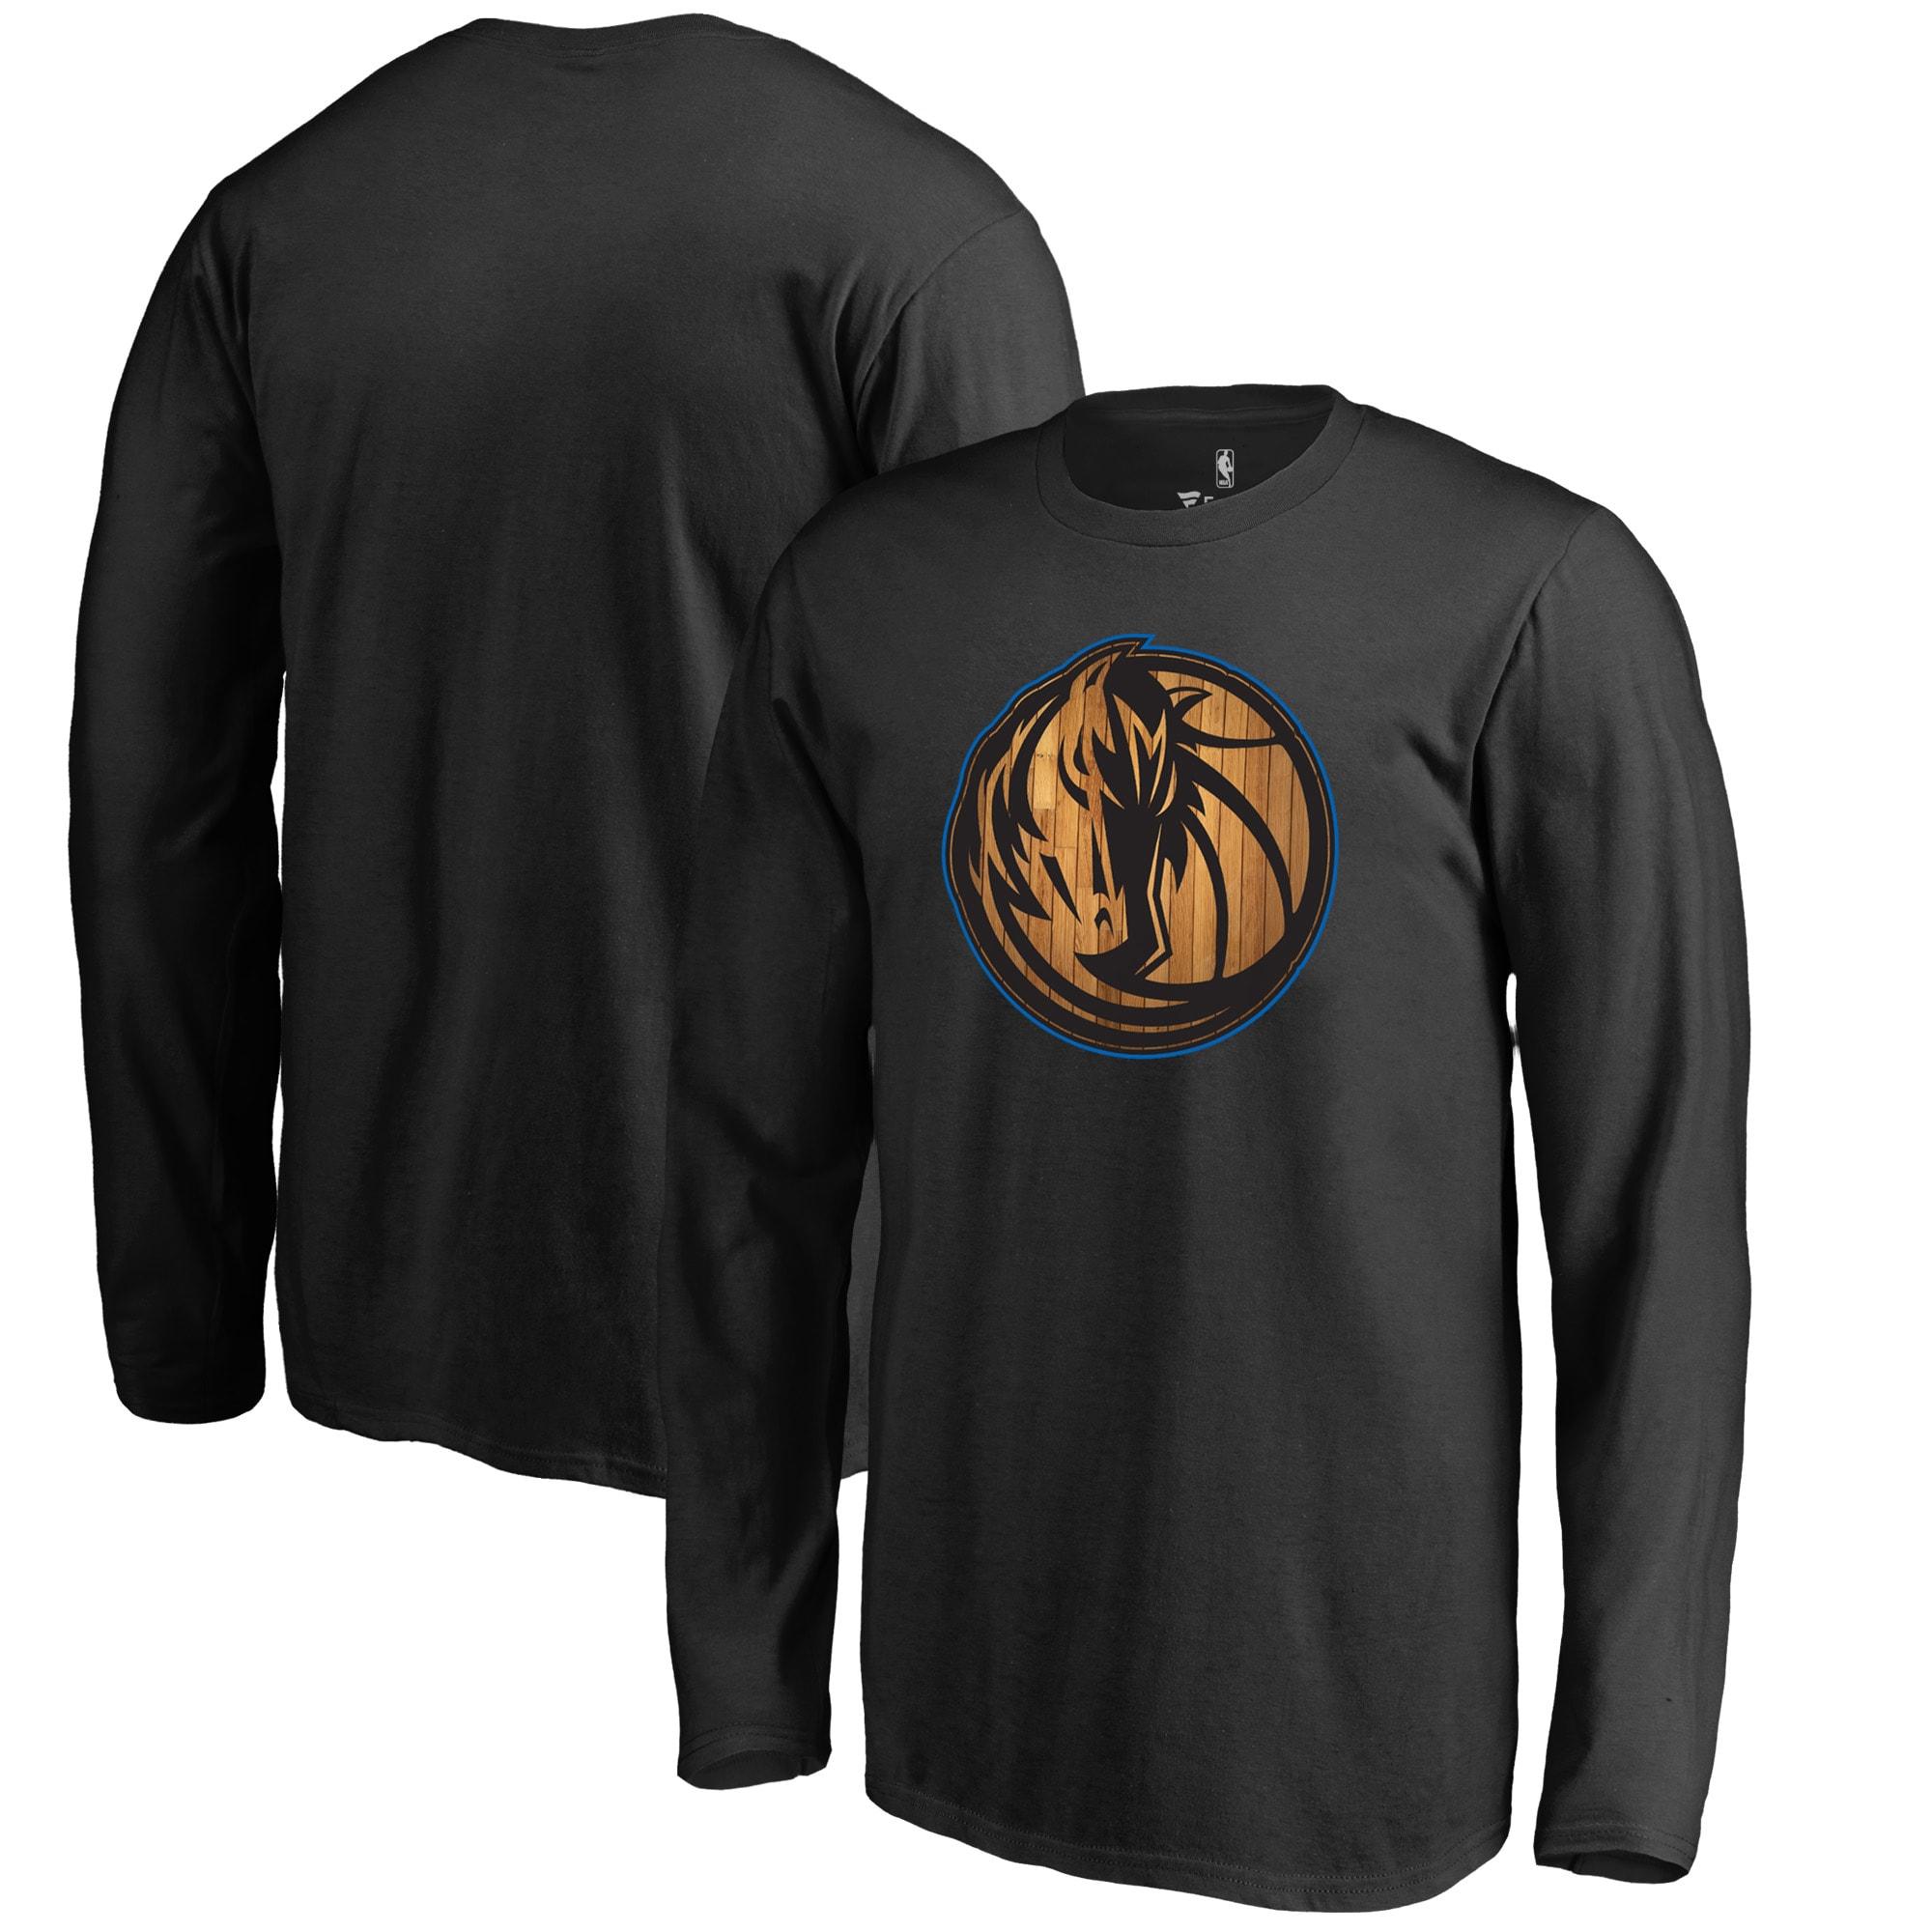 Dallas Mavericks Fanatics Branded Youth Hardwood Long Sleeve T-Shirt - Black